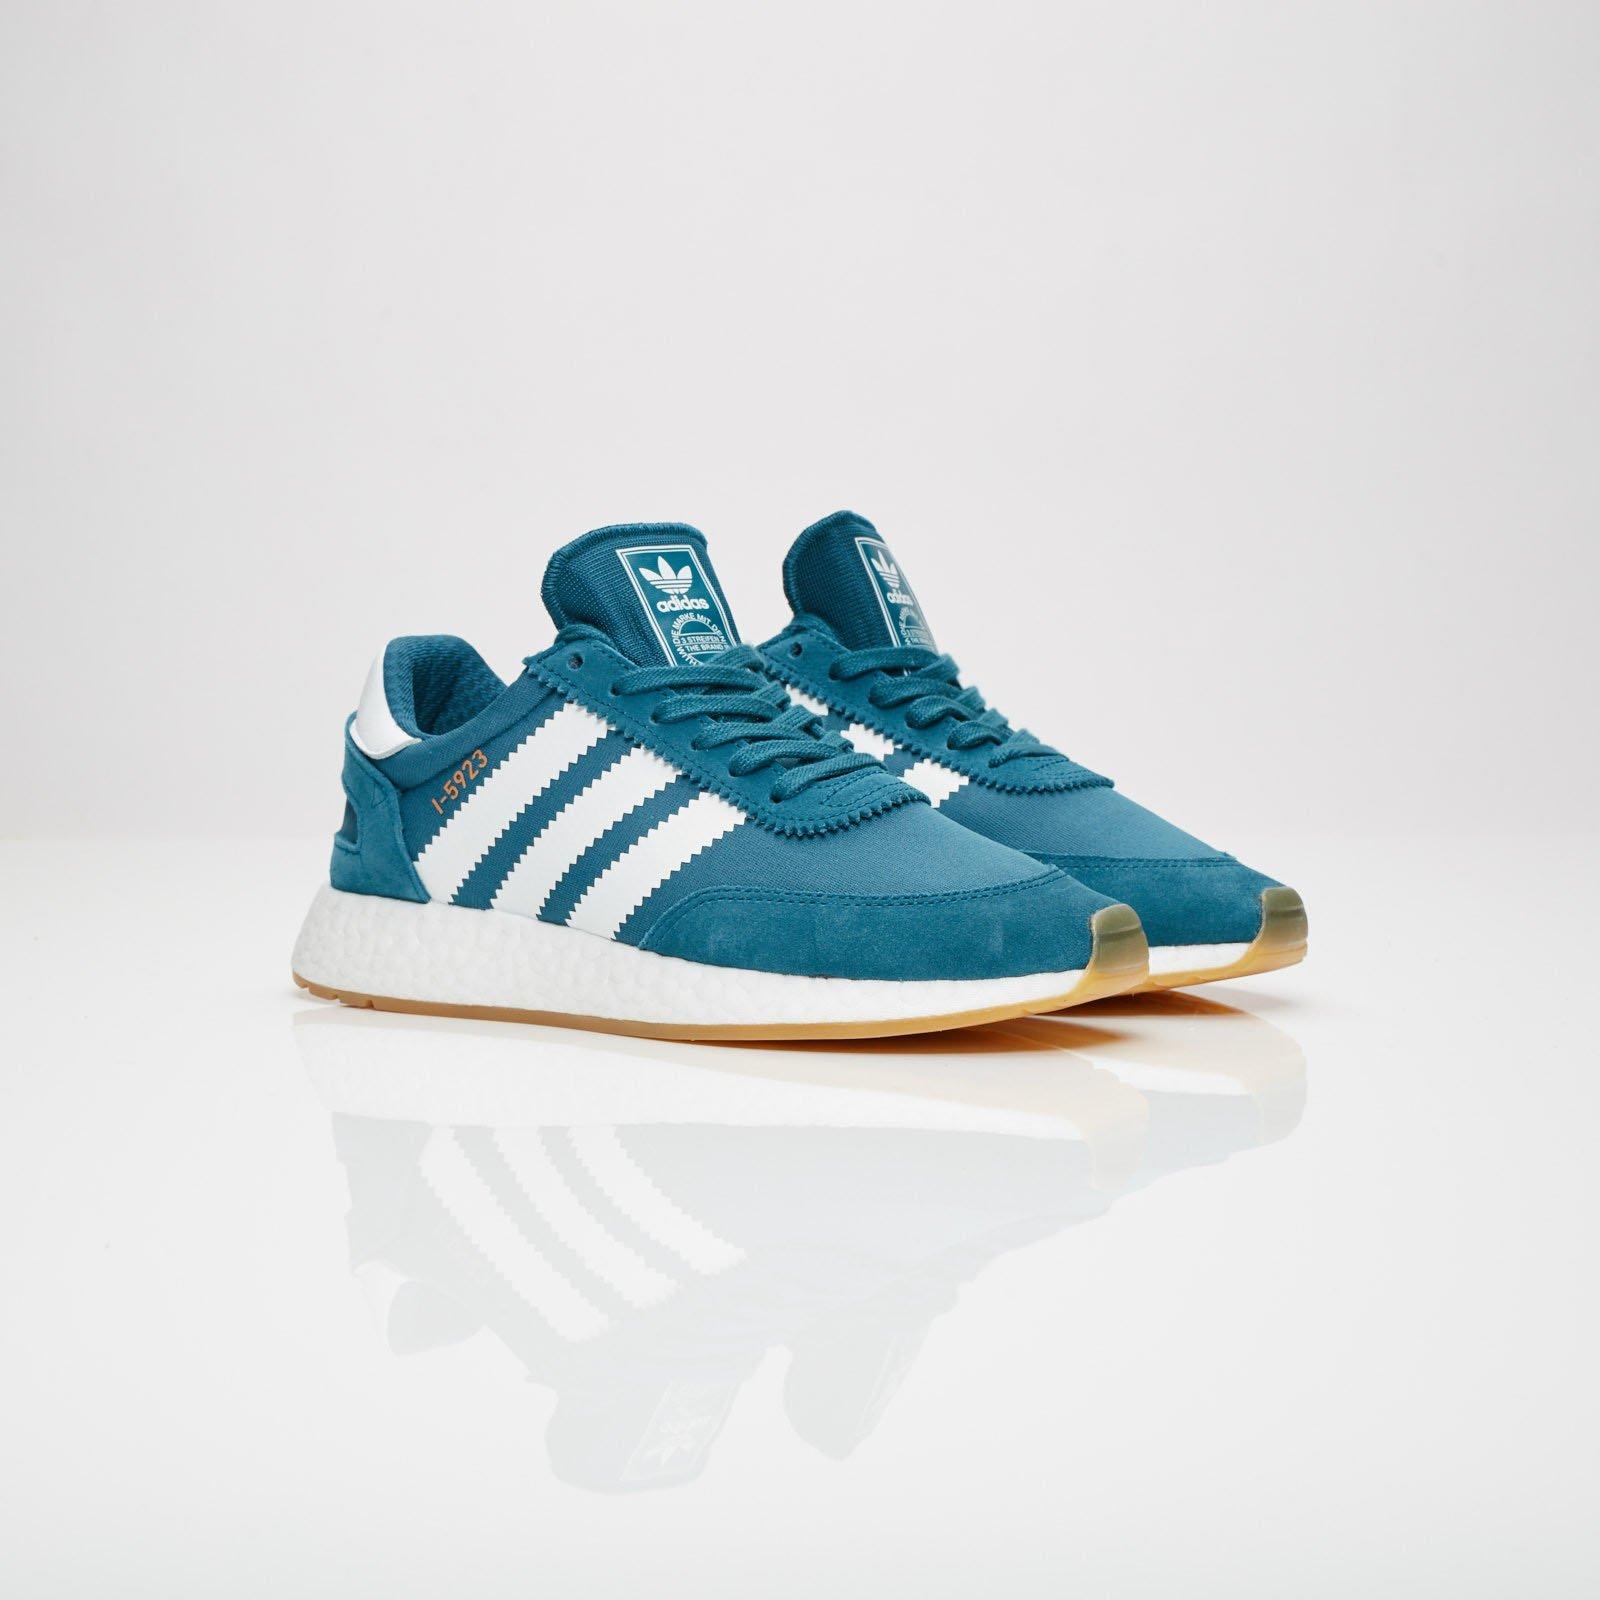 Adidas 5923 I SneakersnstuffSneakersamp; Cq2529 Streetwear DYHE29IeWb